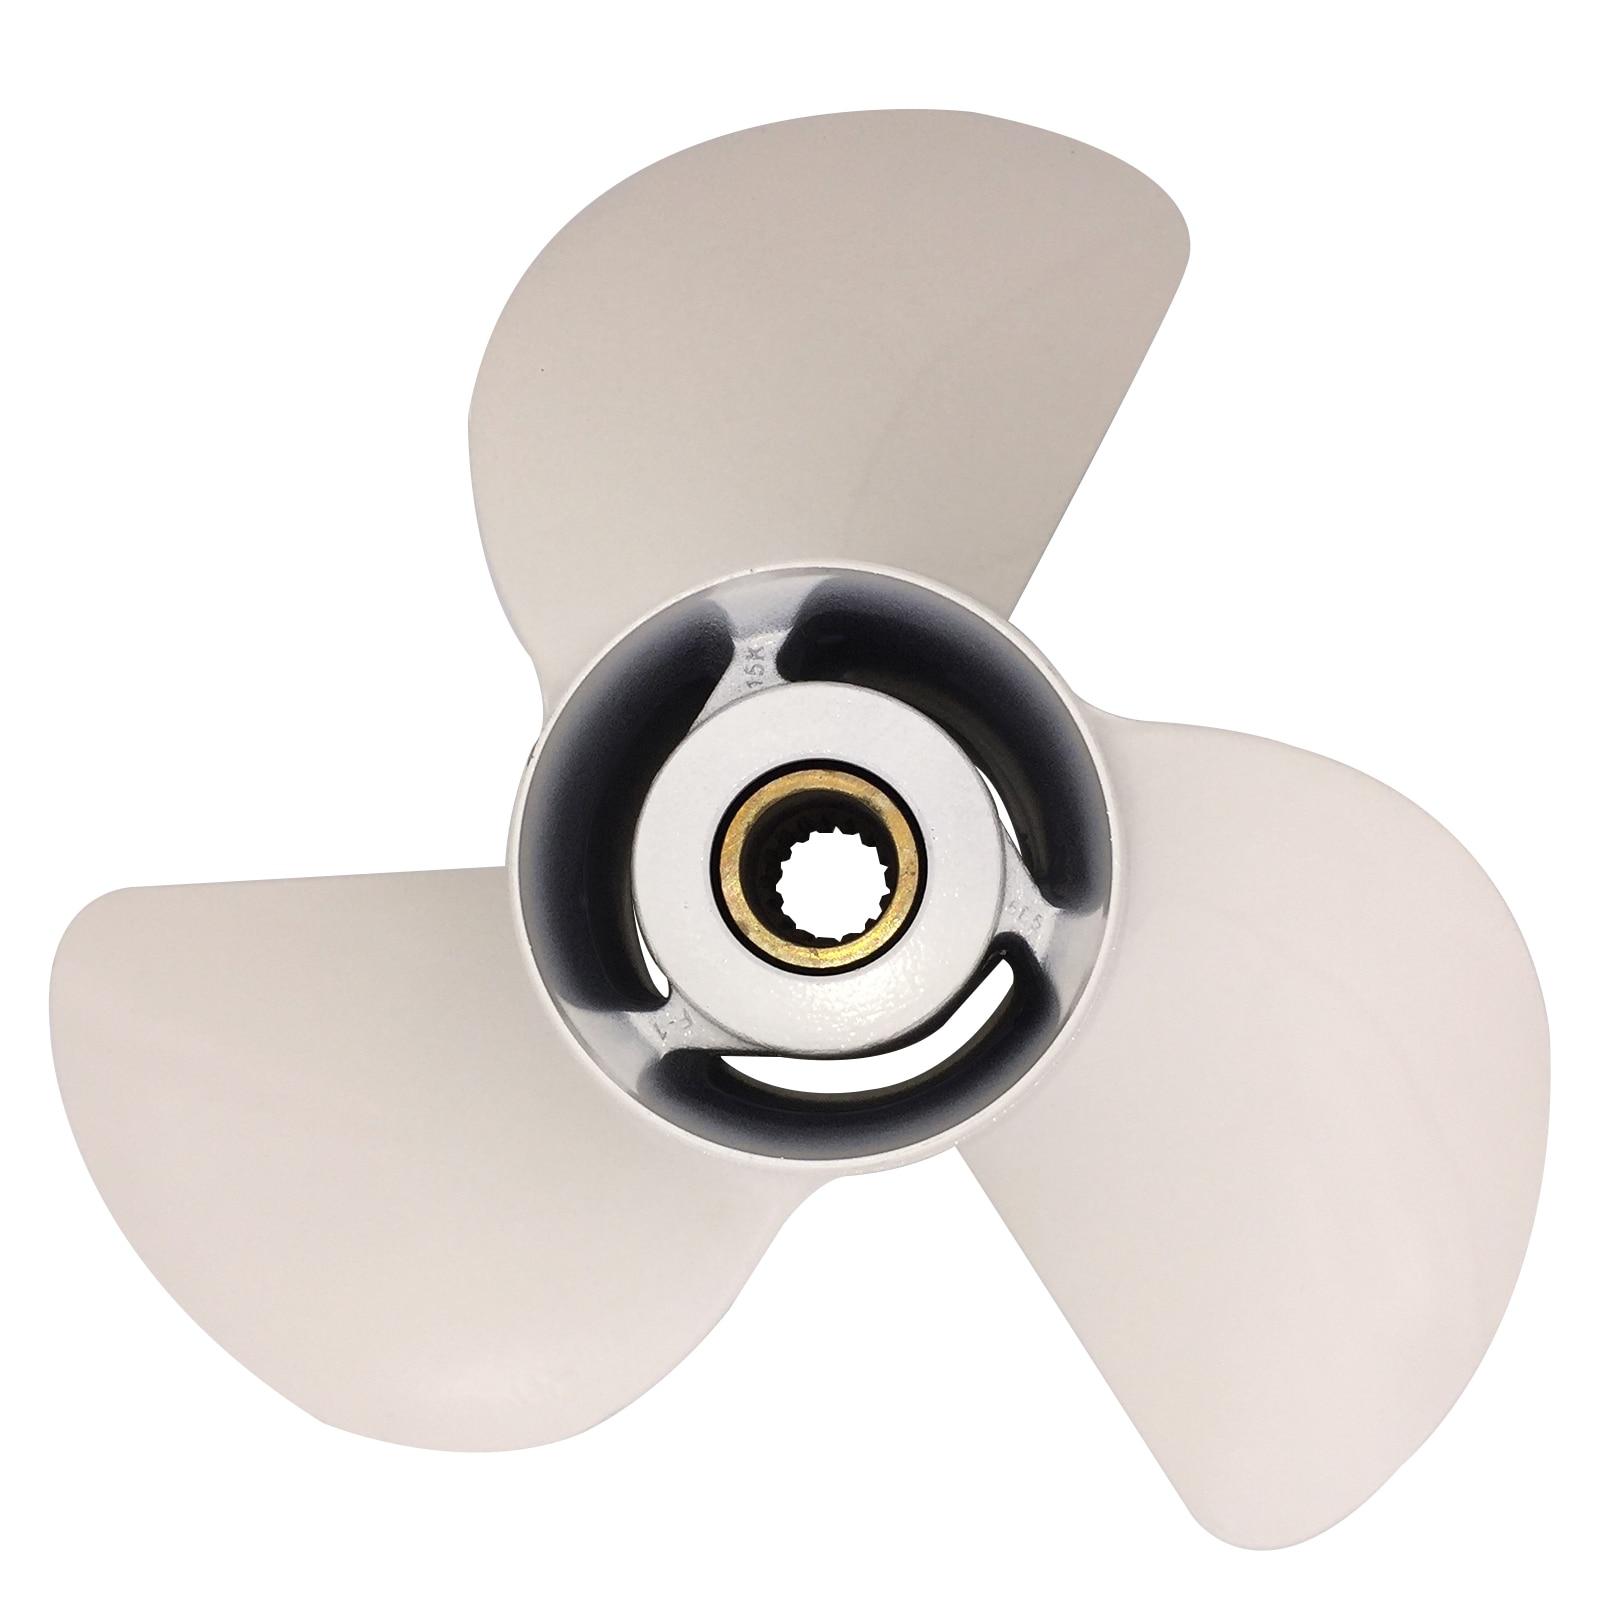 Boat Propeller 13 1/2x17 for Yamaha 60HP-115HP 3 Blades Aluminum Prop 15 Tooth RH OEM NO: 68V-45941-00-00 13.5x17 enlarge